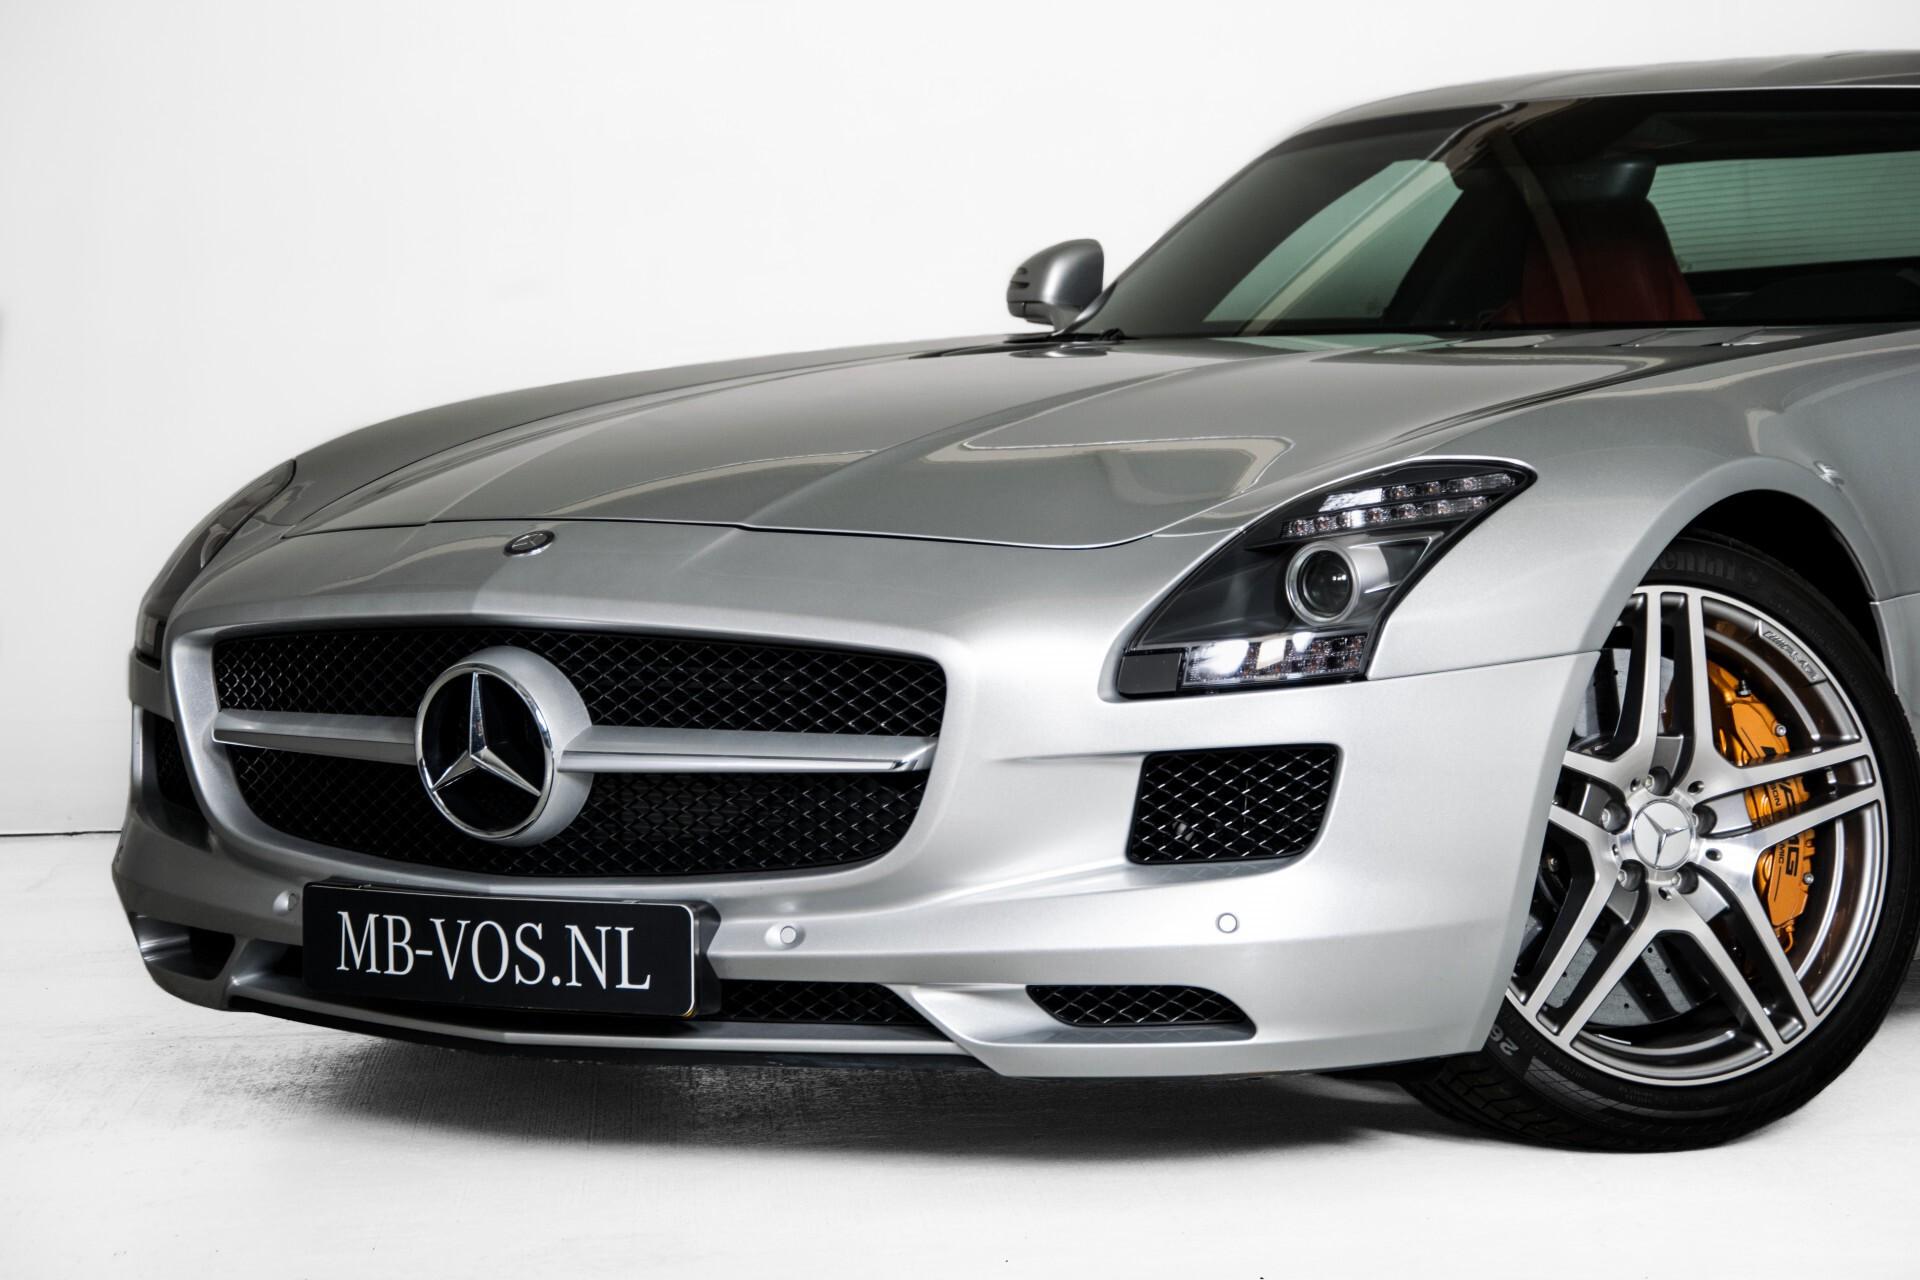 Mercedes-Benz SLS-Klasse Coupe 6.3 AMG 1ste eigenaar/NL Auto FULL OPTIONS Aut7 Foto 55